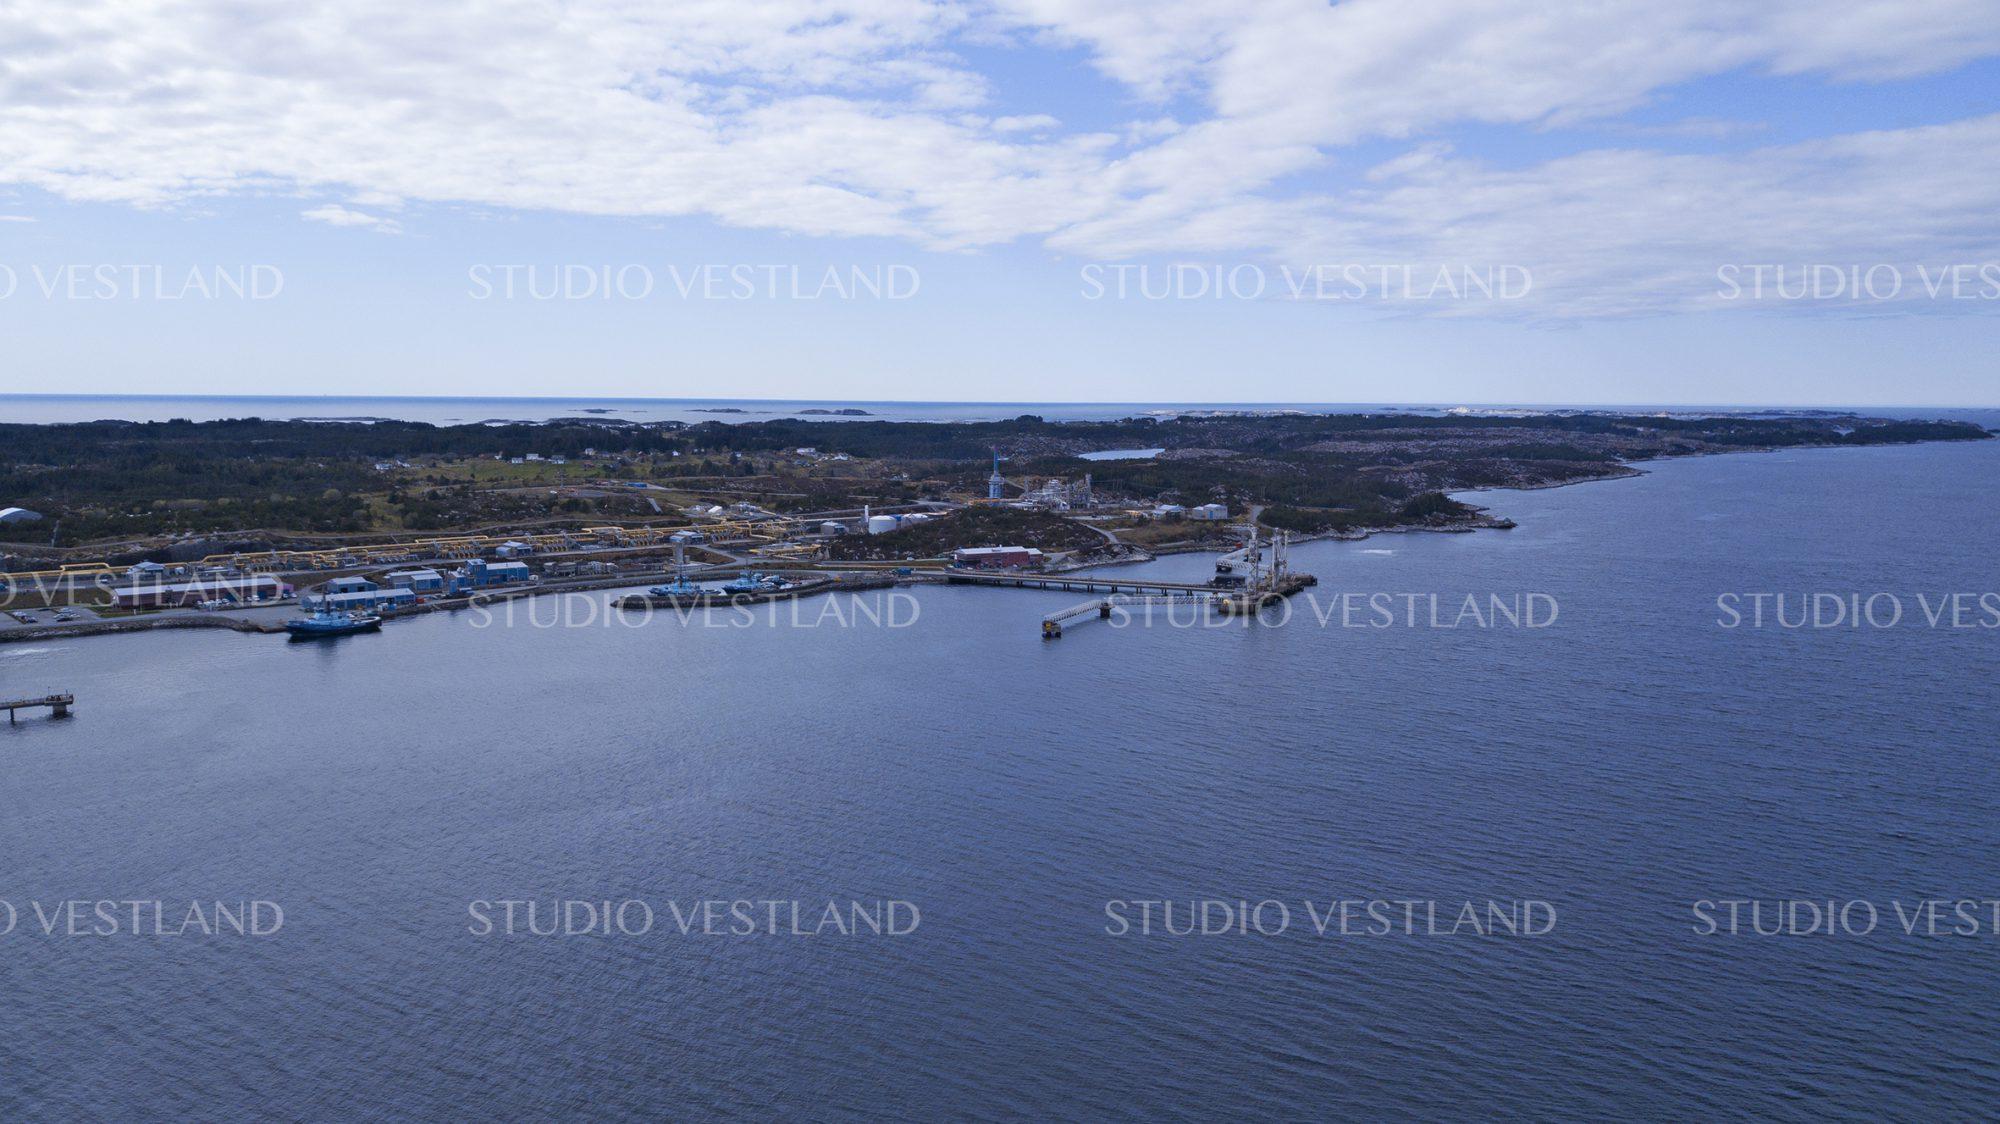 Studio Vestland - Stureterminalen 4